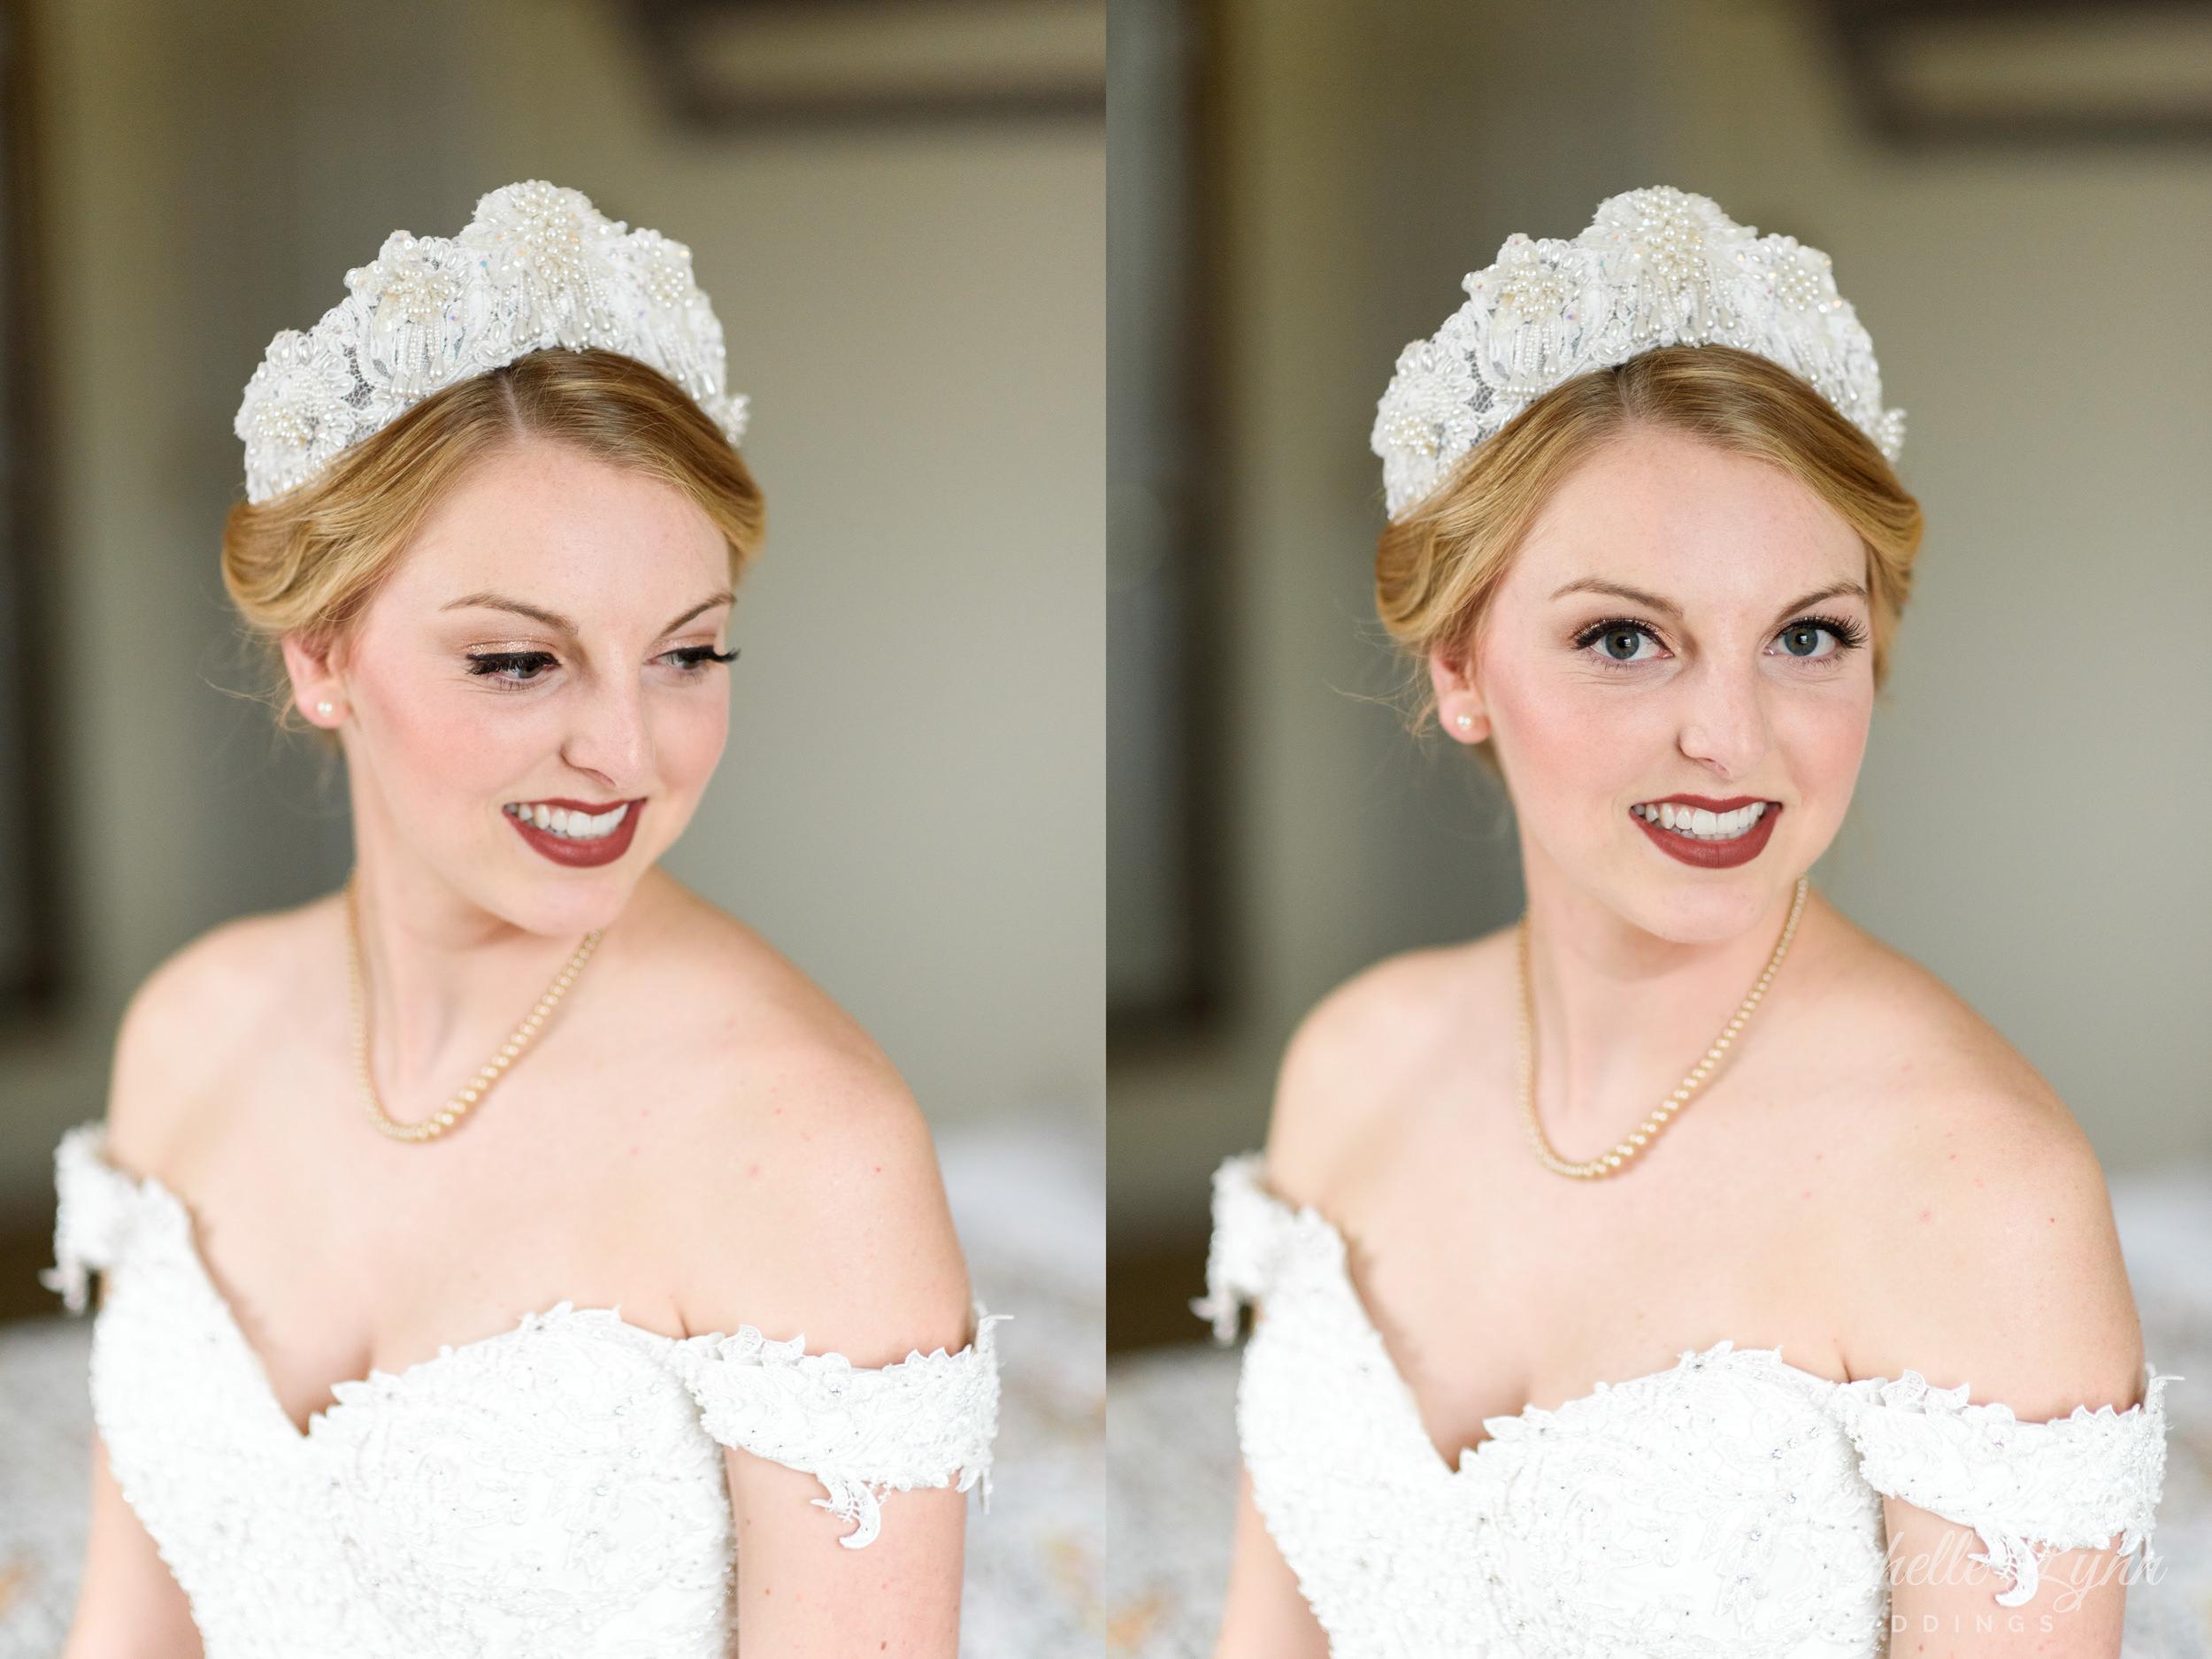 william-penn-inn-wedding-photography-mlw-18.jpg